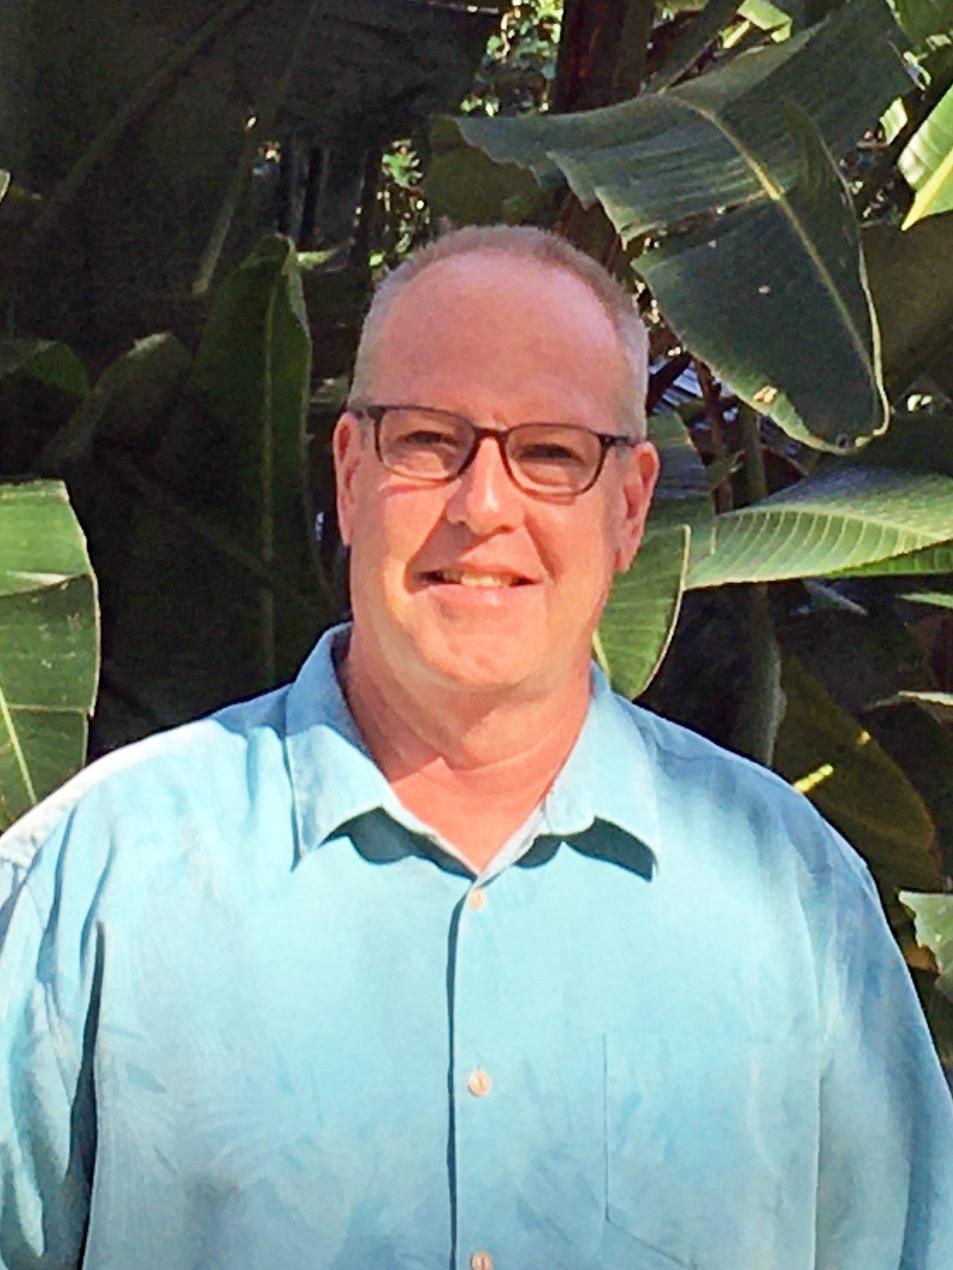 Dave Hirshburg